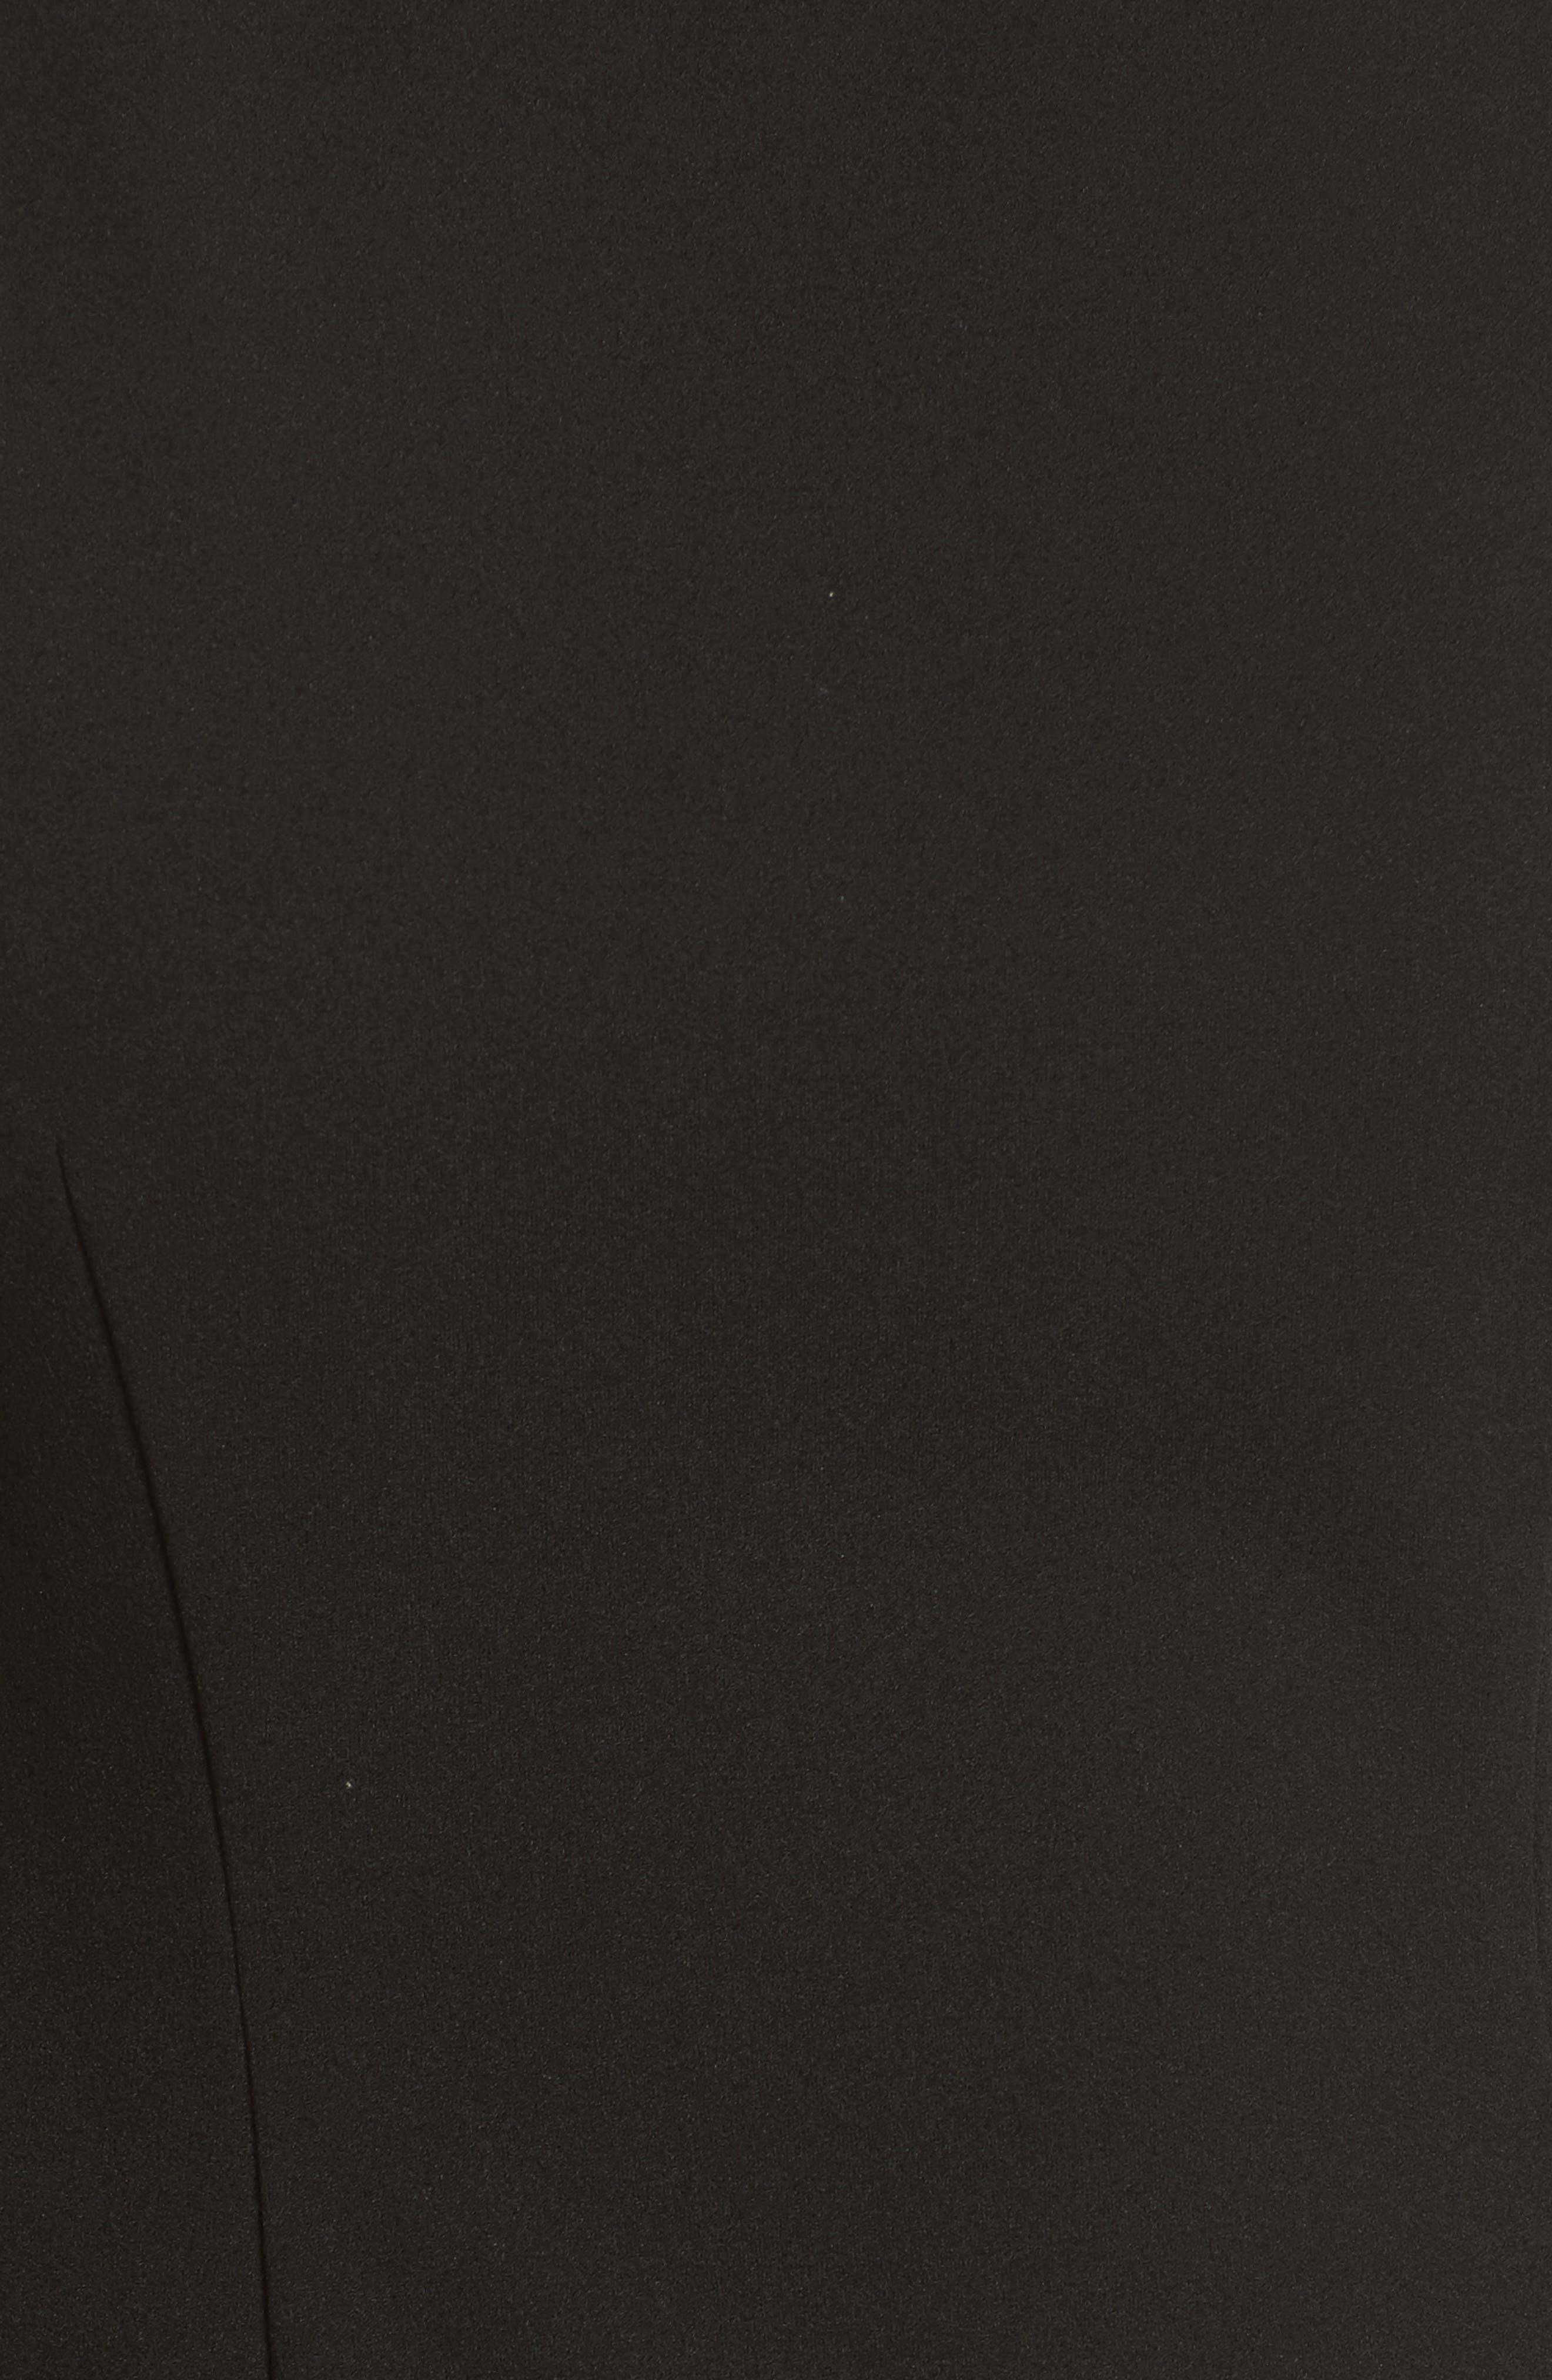 Bead Embellished Crepe Shift Dress,                             Alternate thumbnail 5, color,                             001